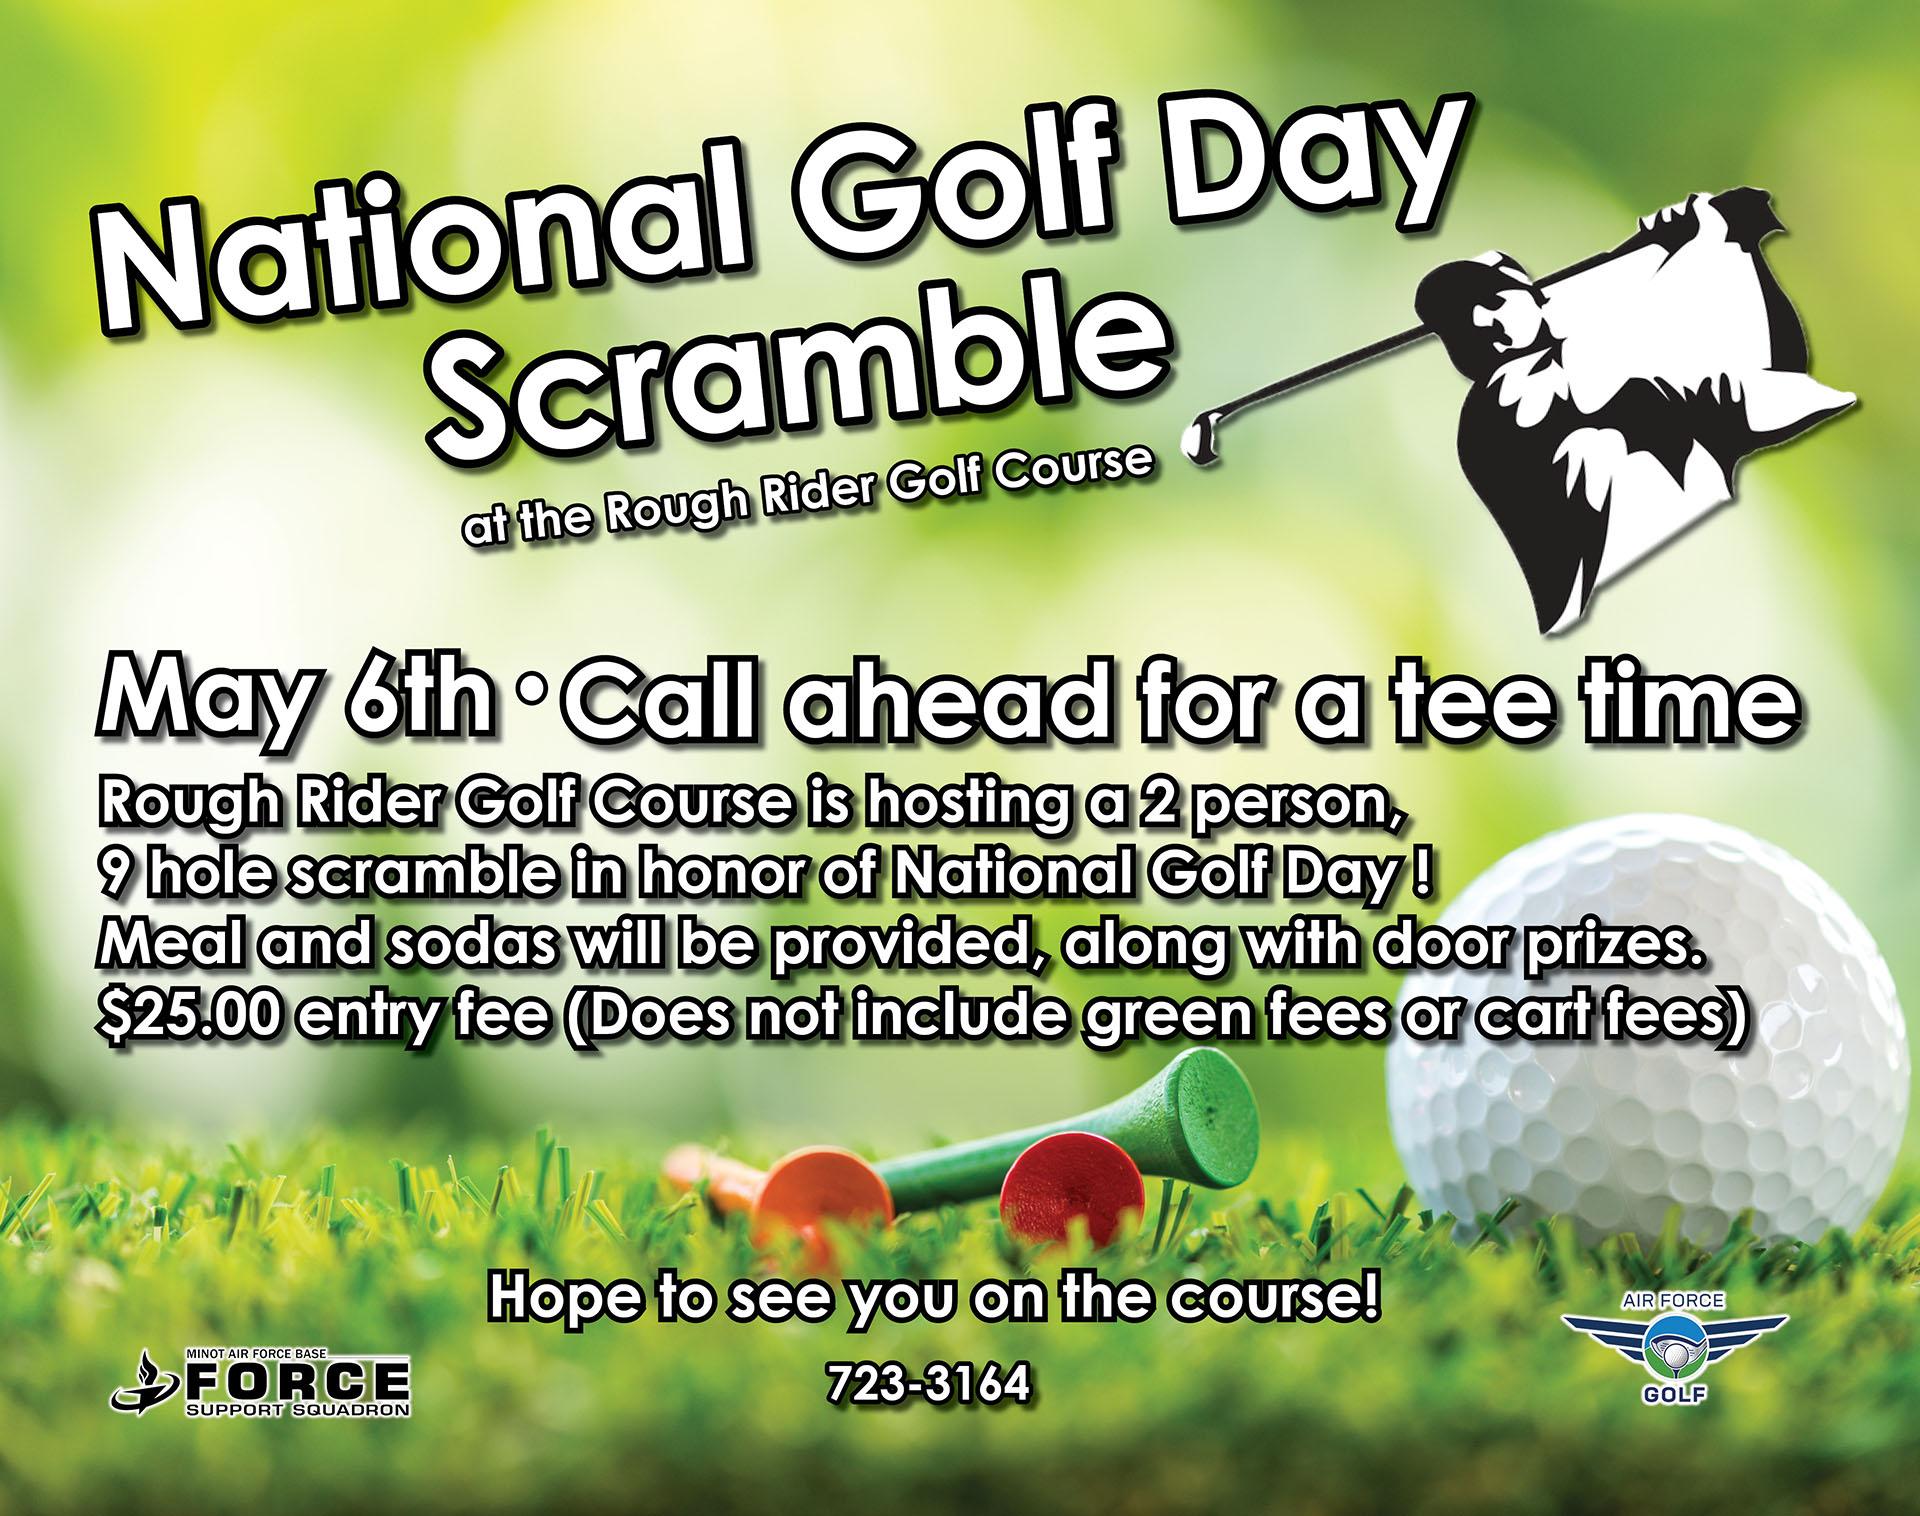 National Golf Day Scramble